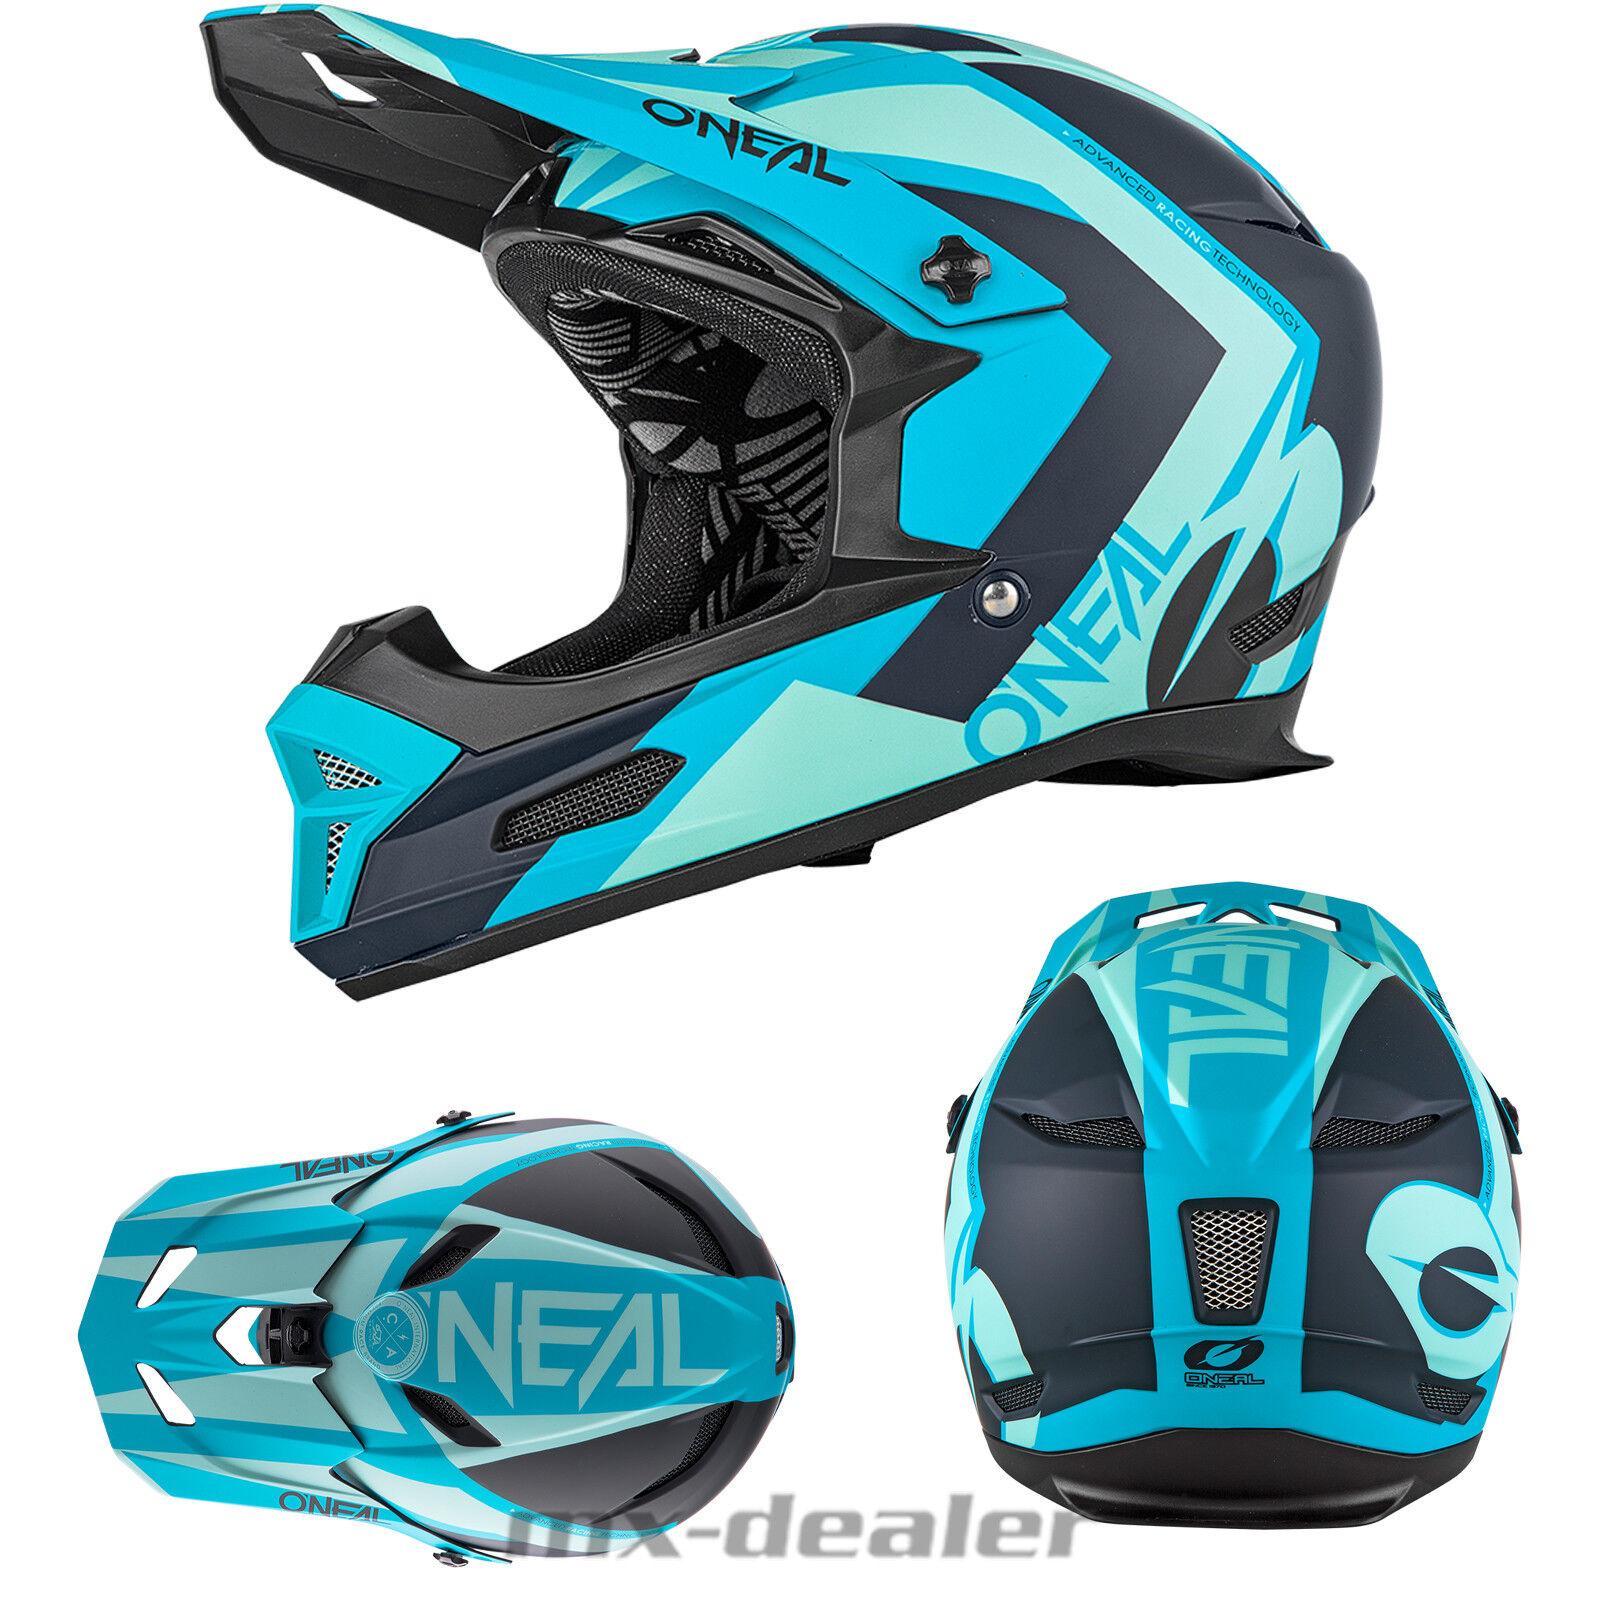 O'Neal 19 Fury Rl Hybrid bluee Petrol MTB Dh Downhill Helmet Freeride Go Pro